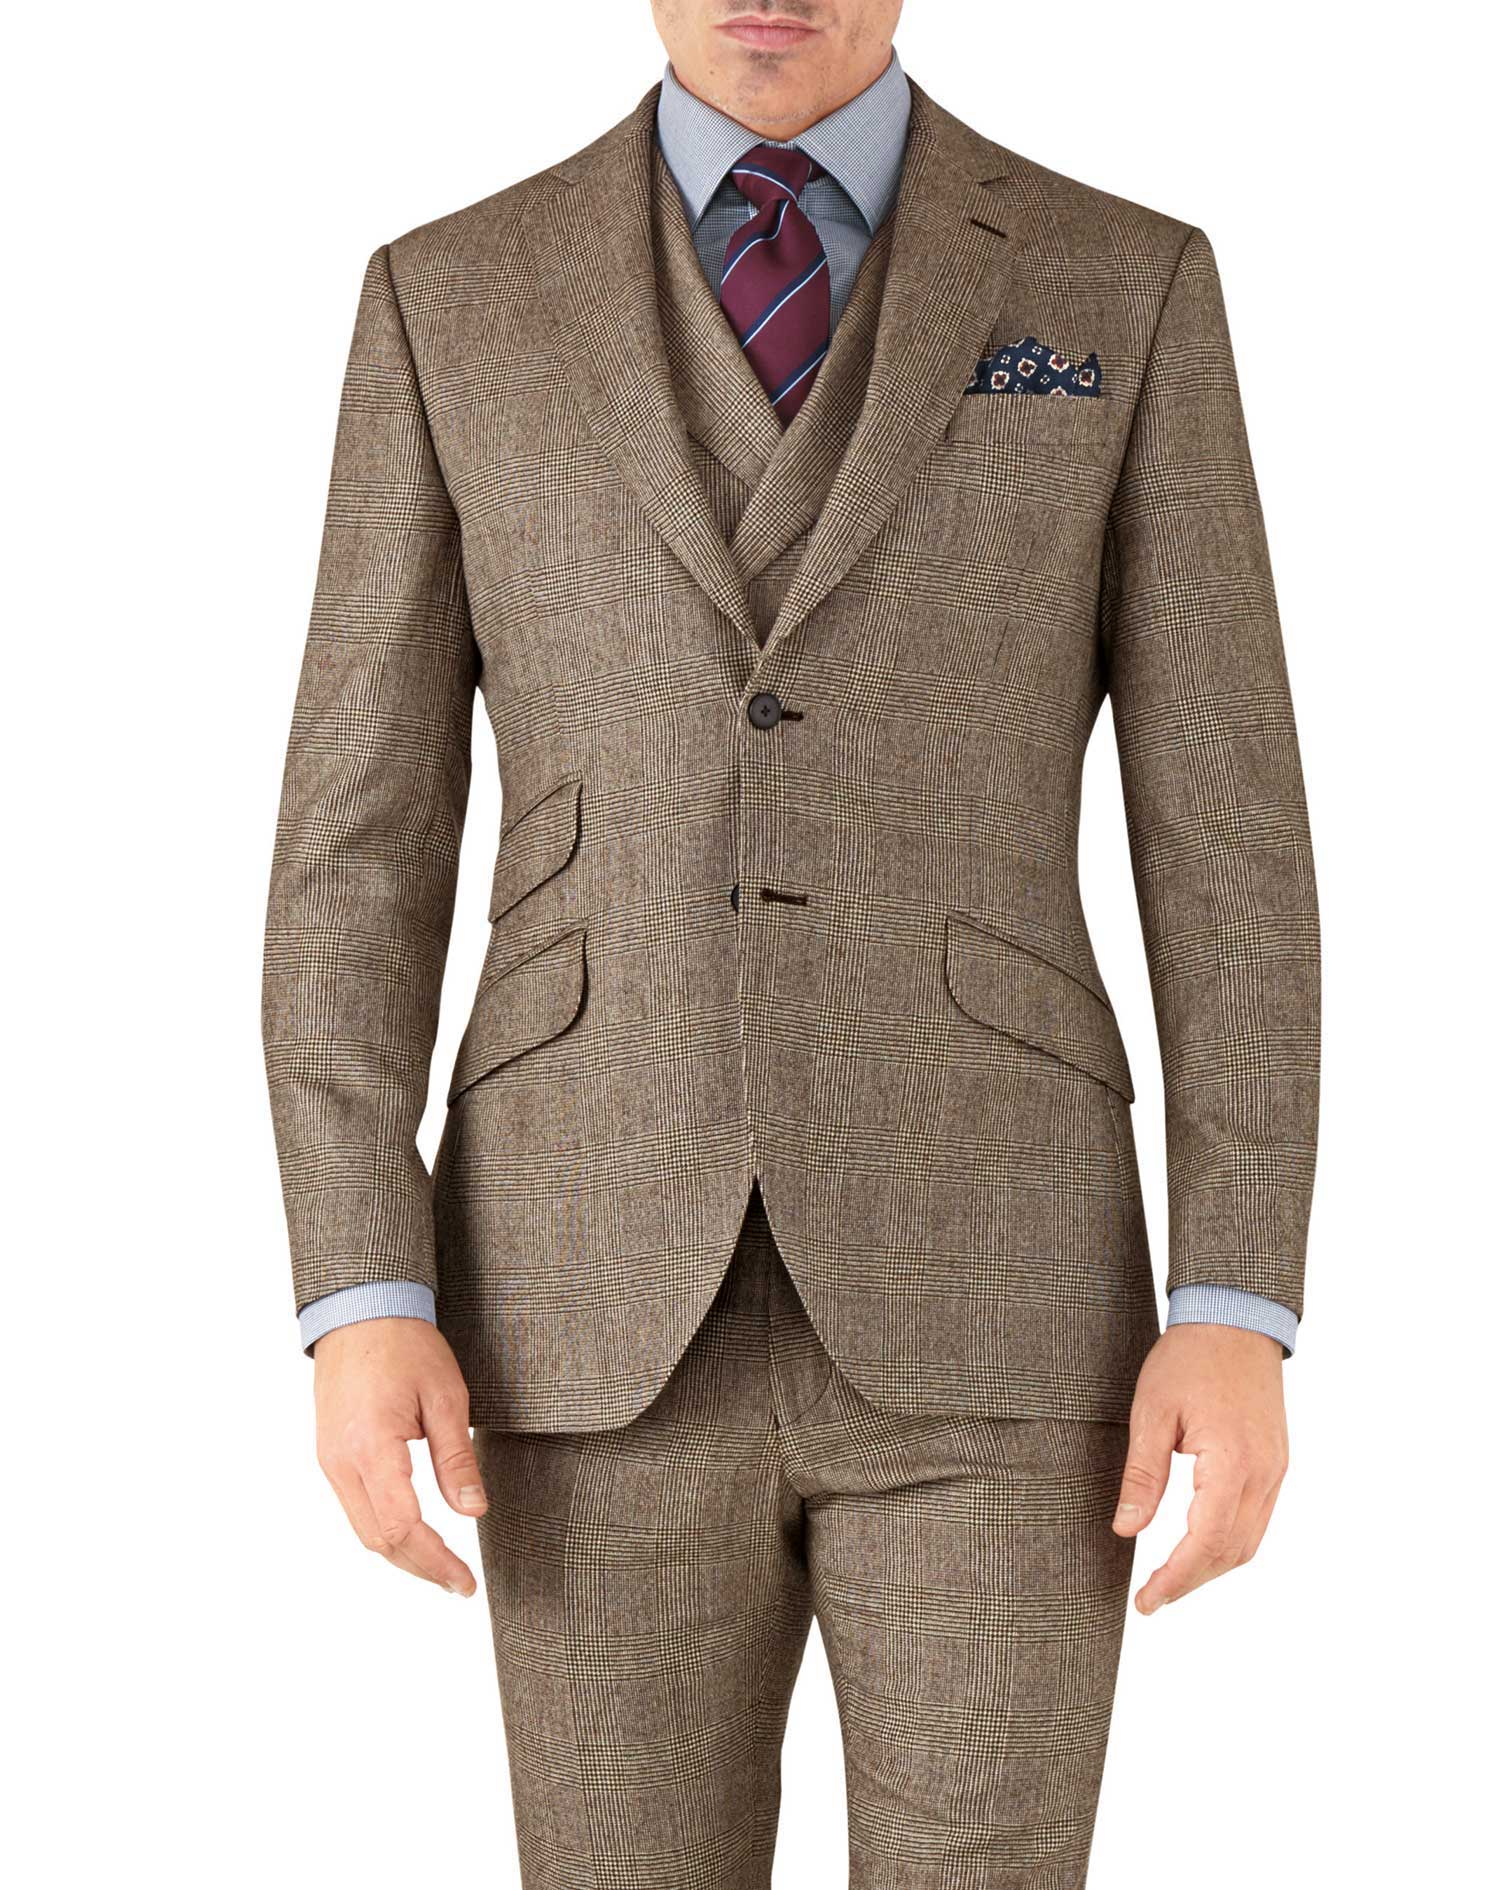 Tan Check Slim Fit British Serge Luxury Suit Wool Jacket Size 44 Short by Charles Tyrwhitt